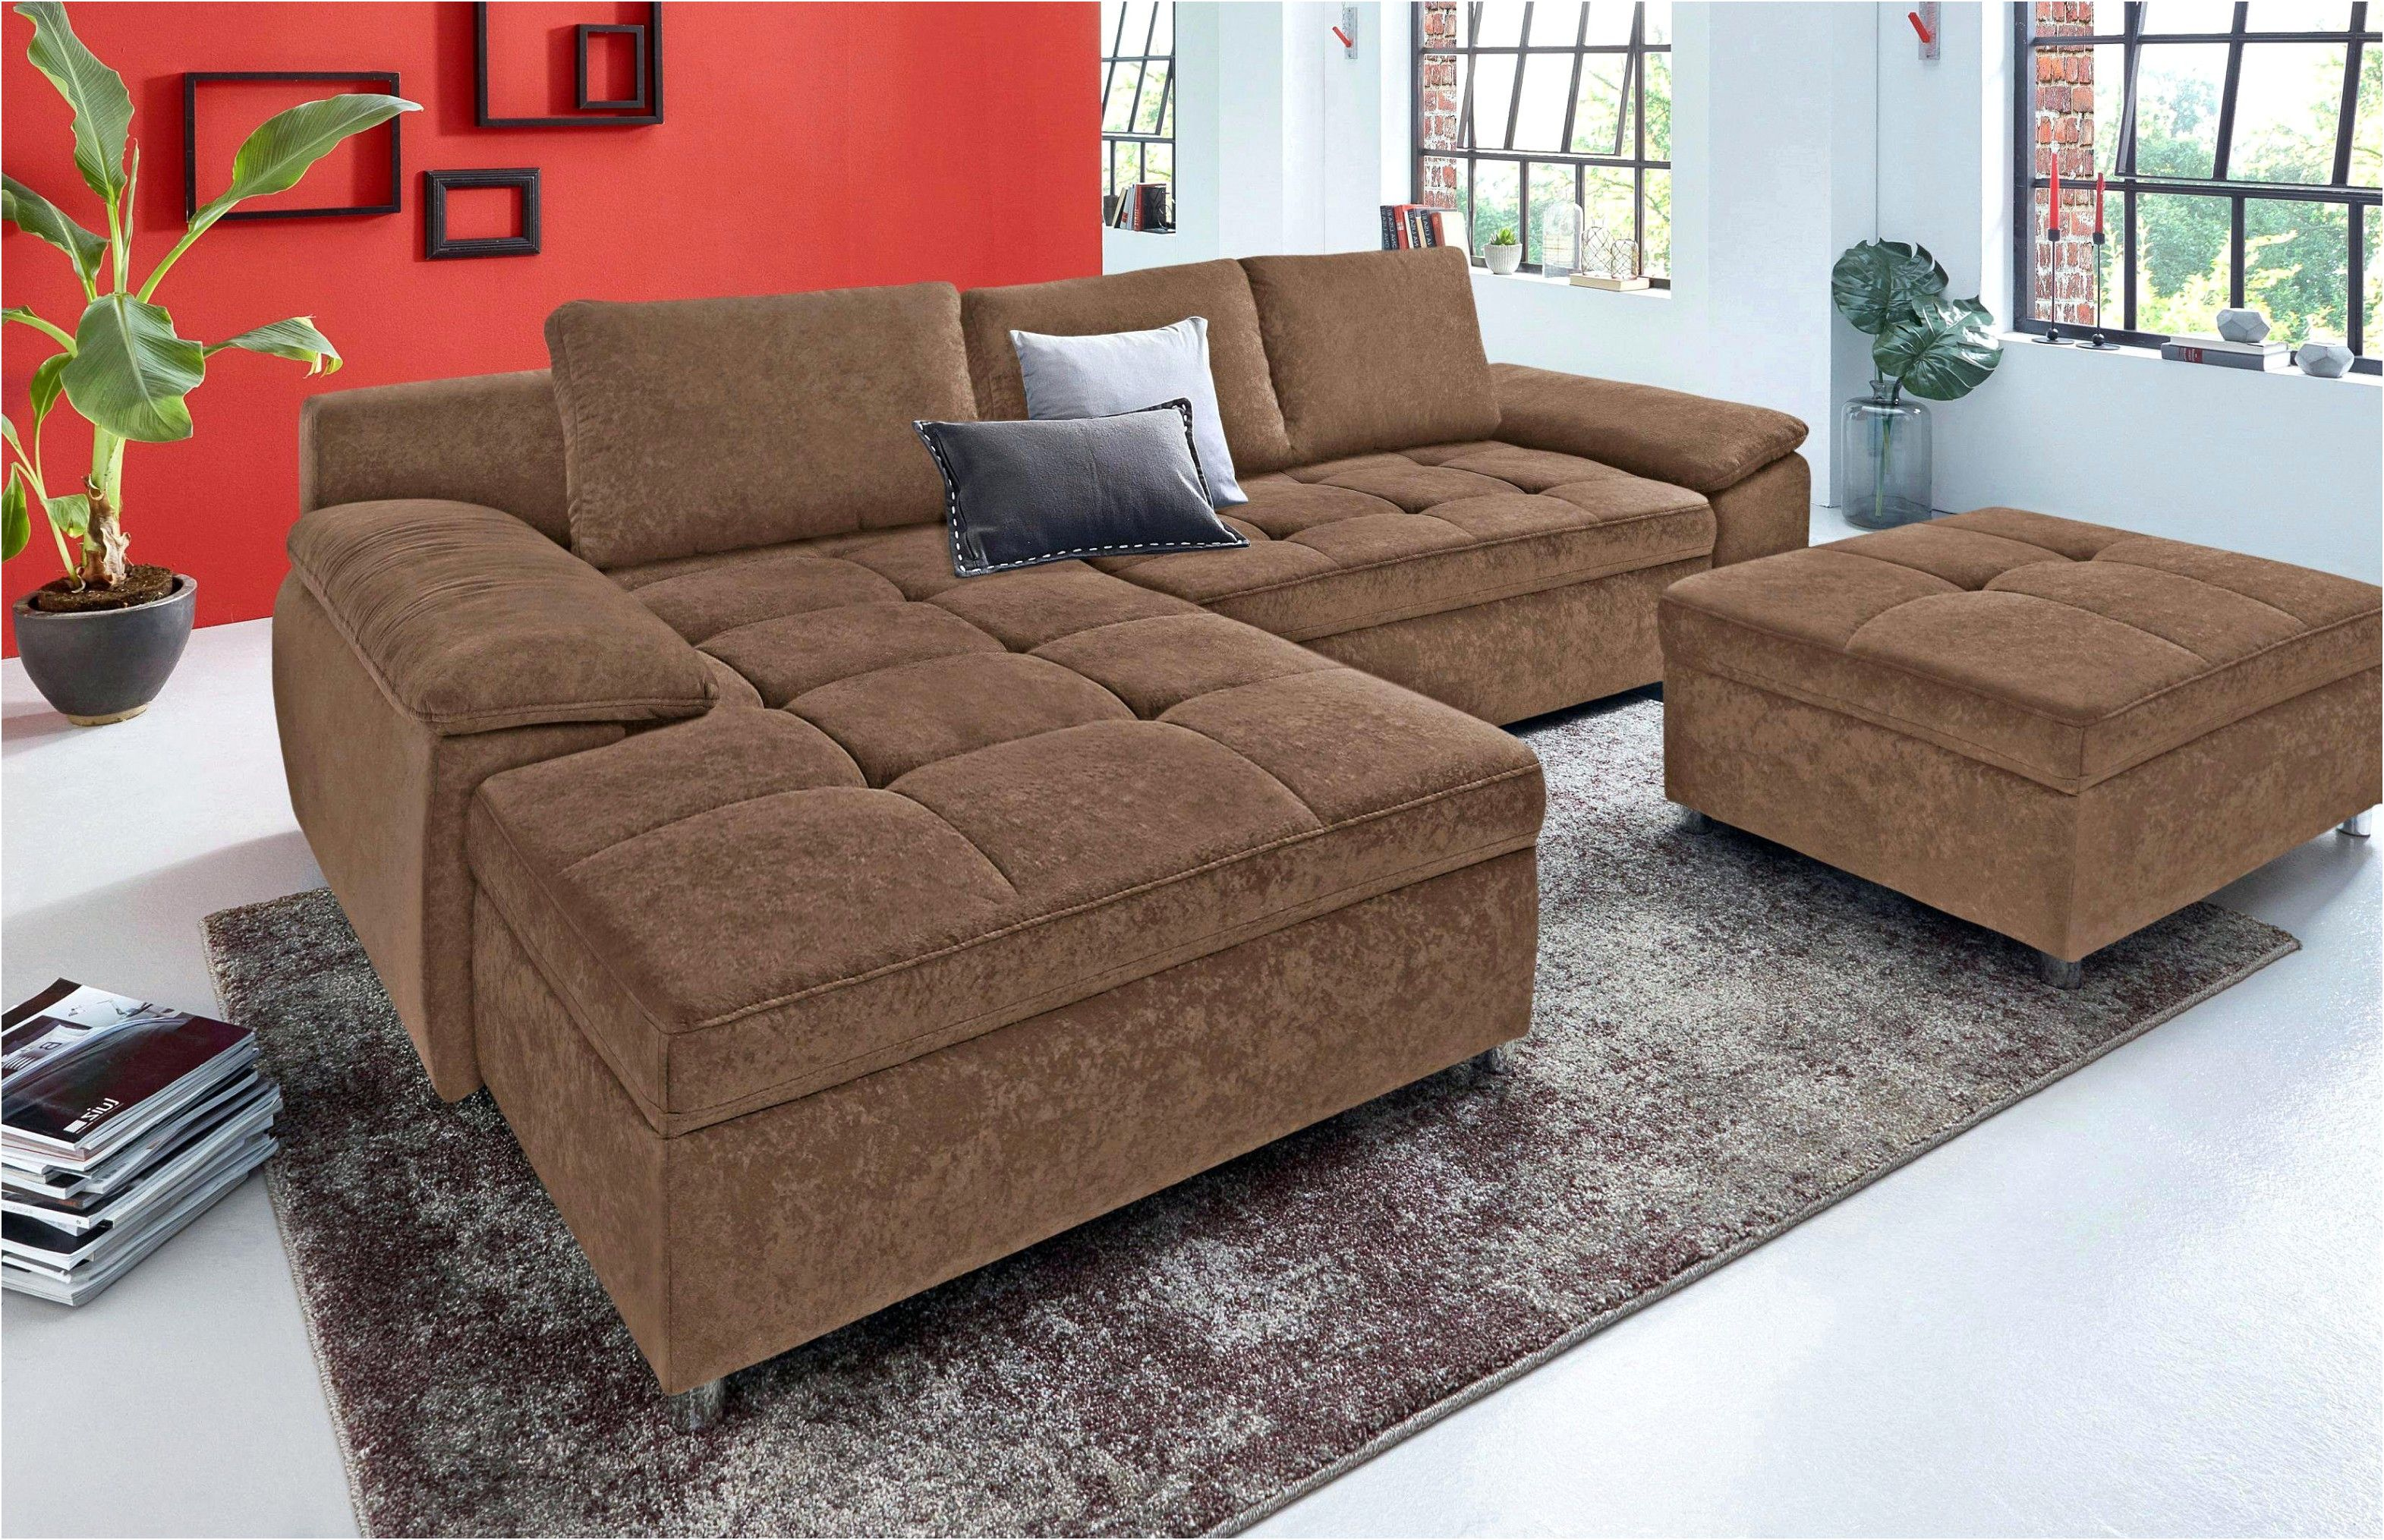 Gross Liegewiese Sofa Bild 1 Liegewiese Sofa Grau Gahn Zum Sofa